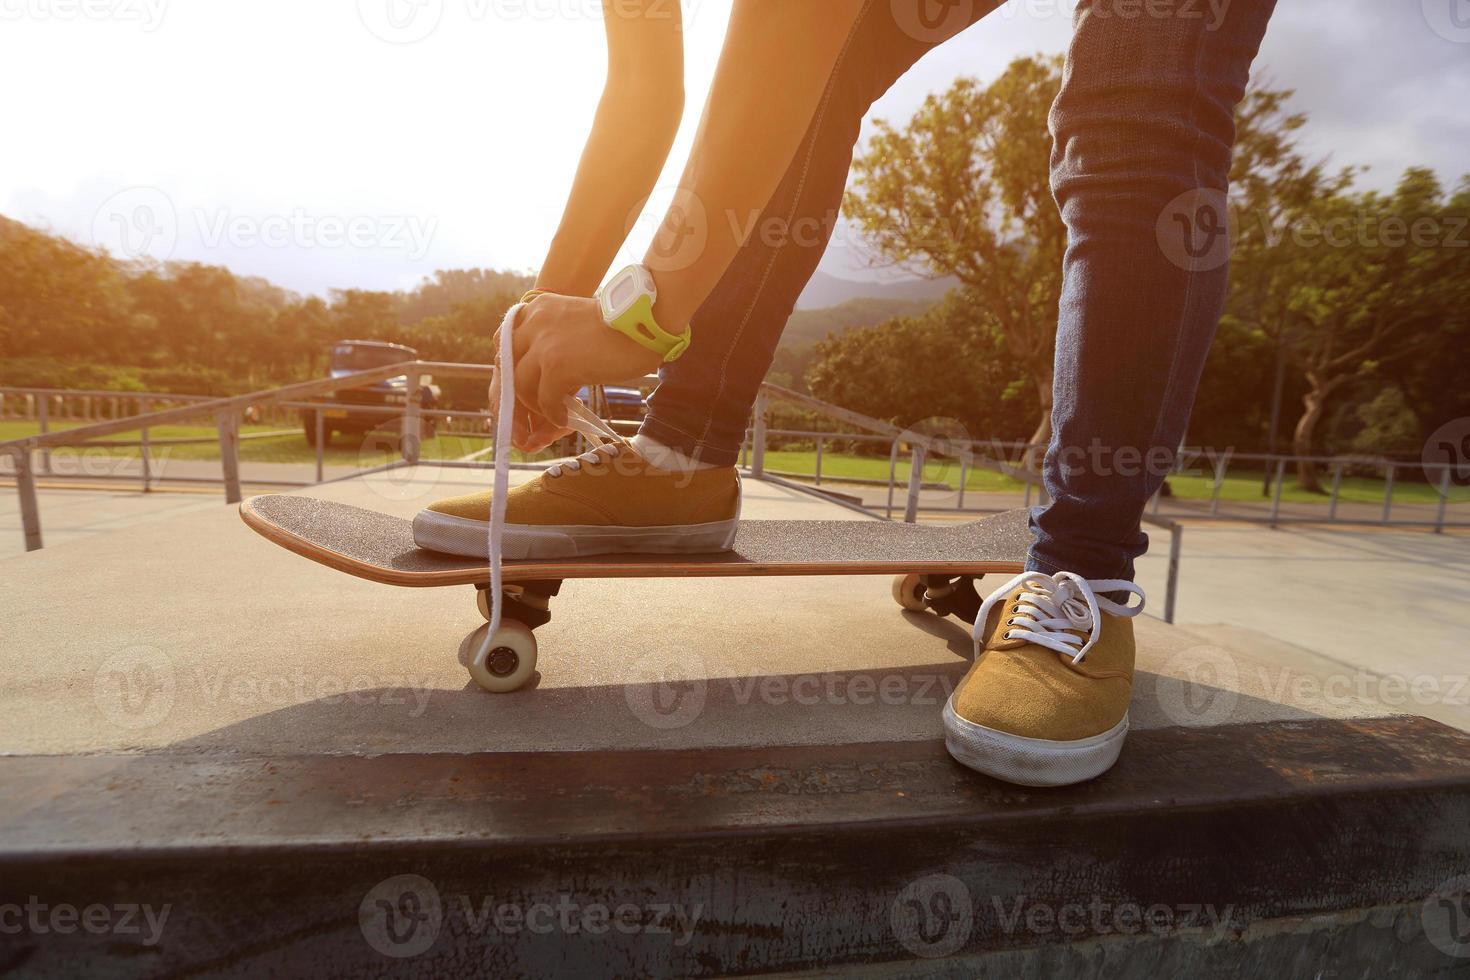 skateboarder händer som knyter skosnören på skateboard foto